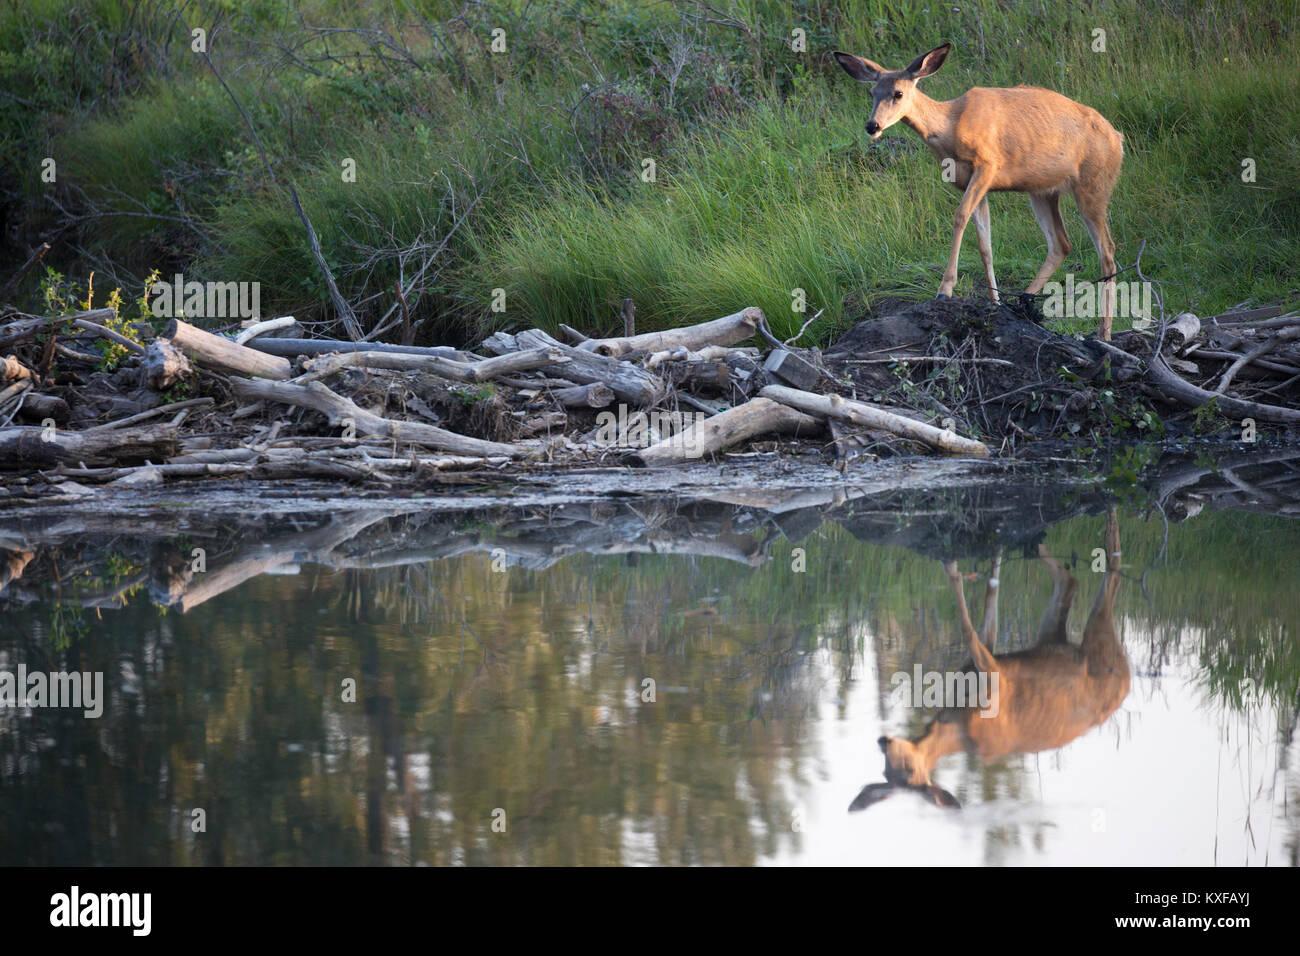 El venado bura caminando a través de beaver pond (Odocoileus hemionus) Imagen De Stock